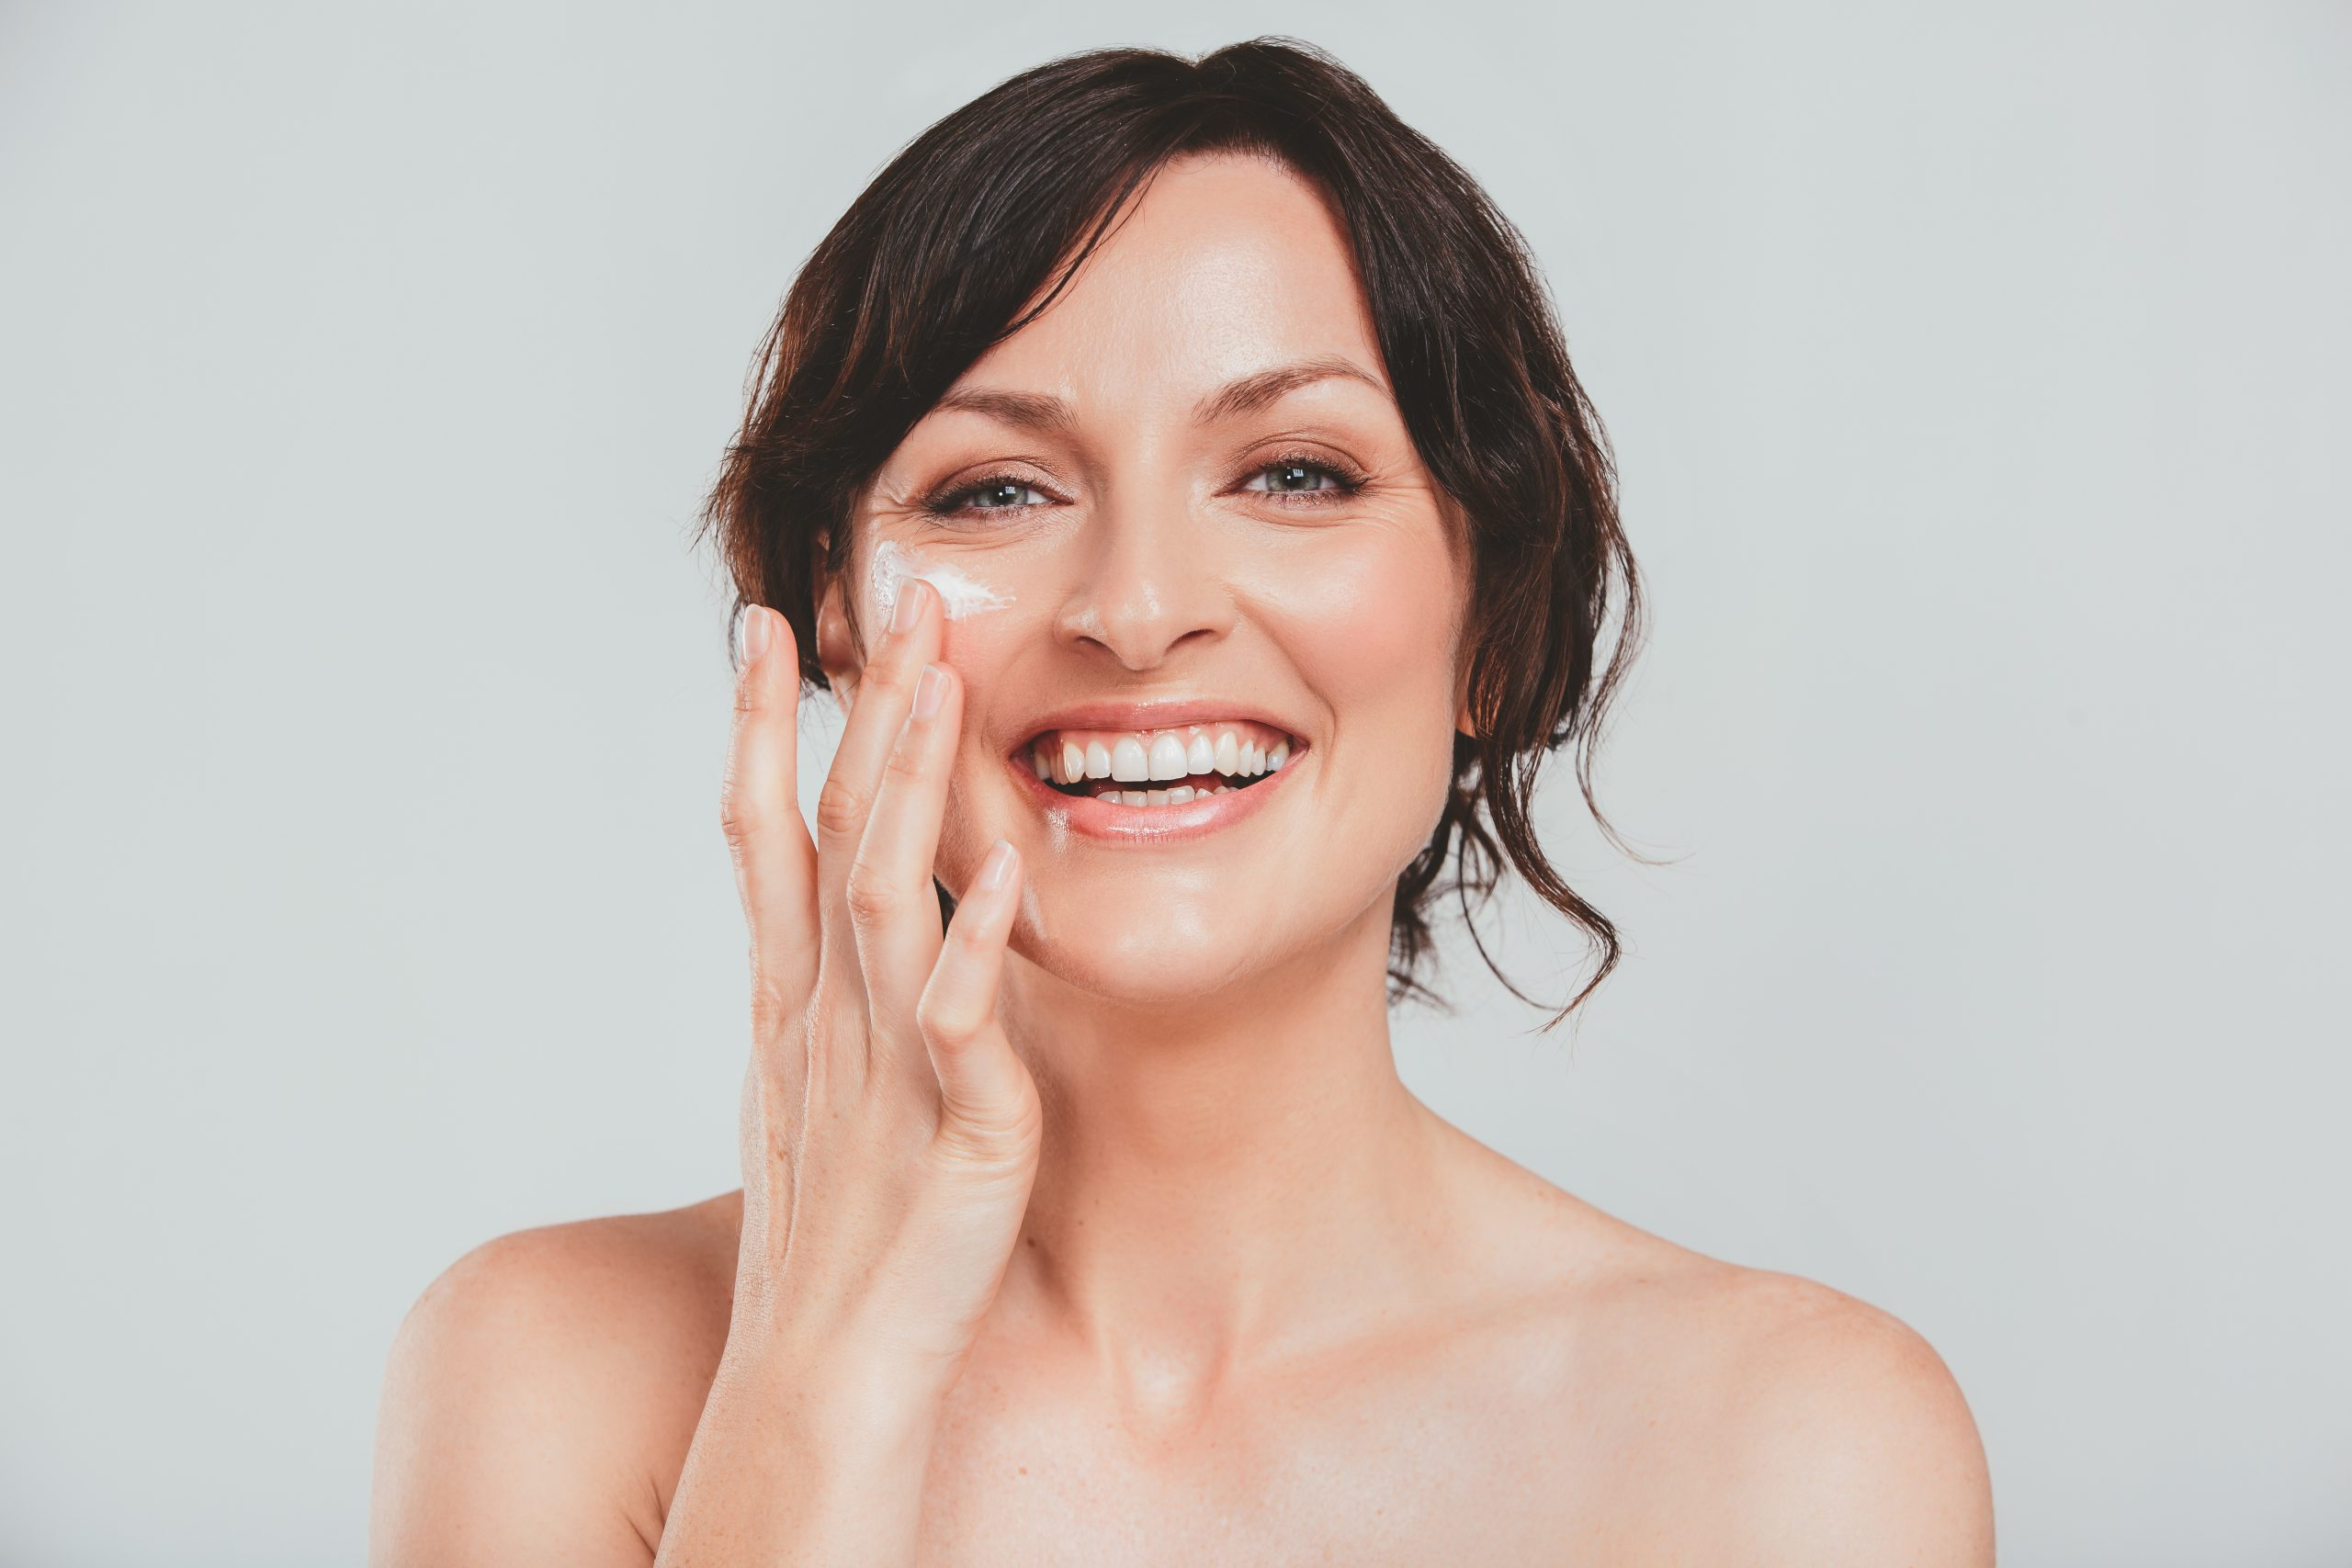 skincare routine | ditch the moisturiser, says expert